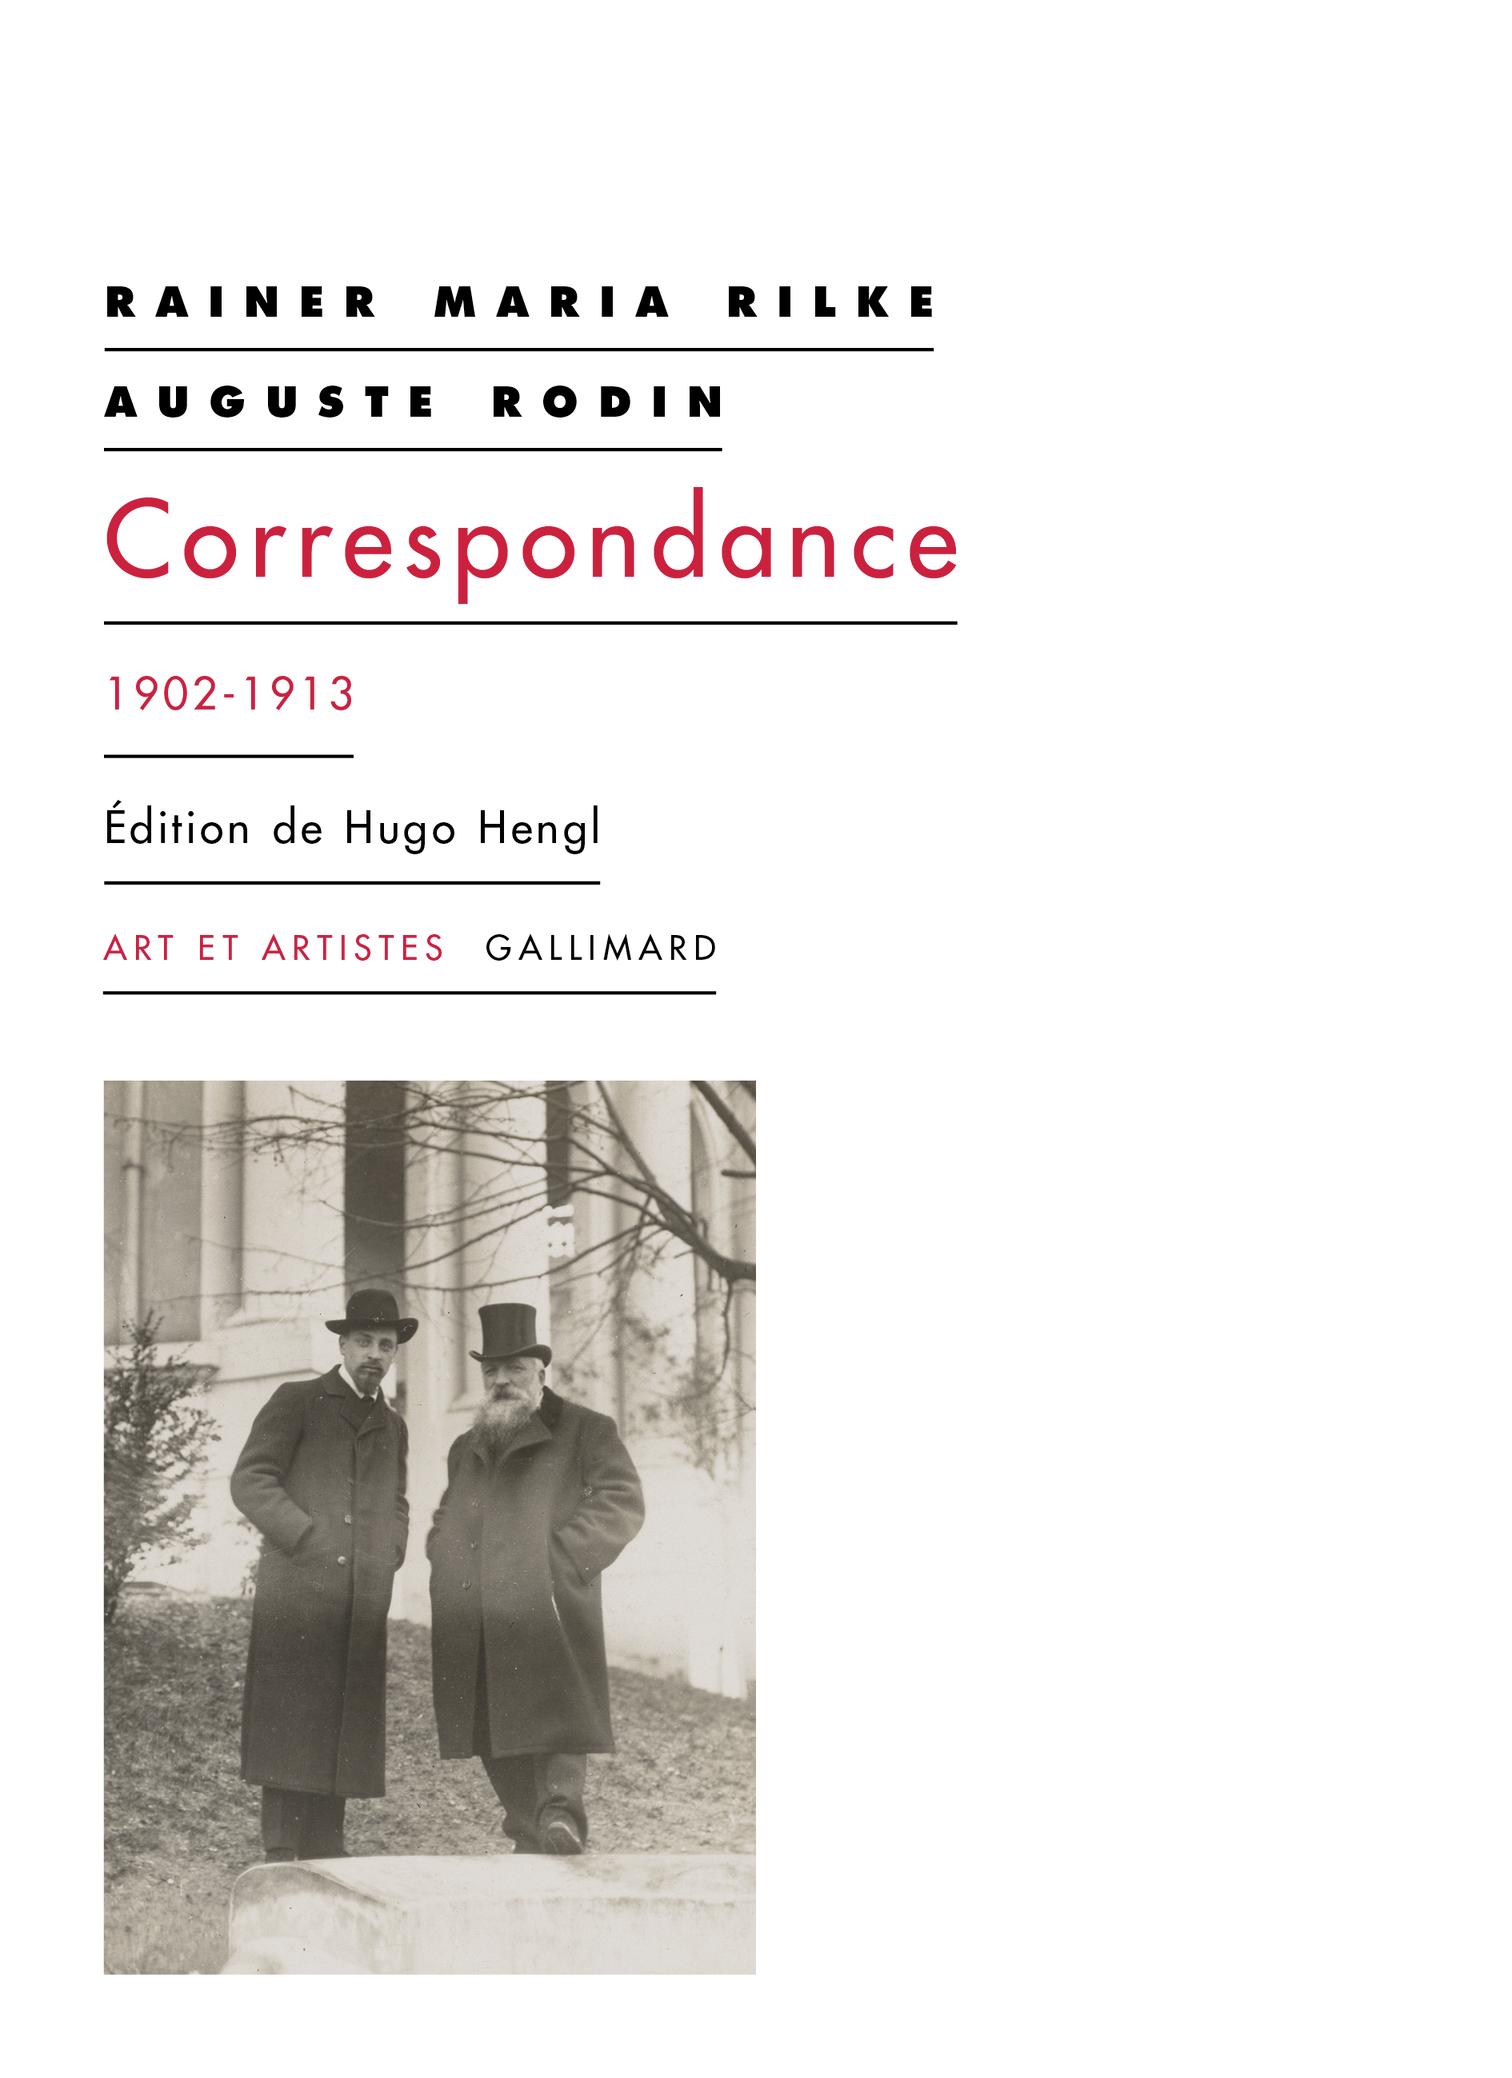 R.M. Rilke, A. Rodin, Correspondance (1902-1913)